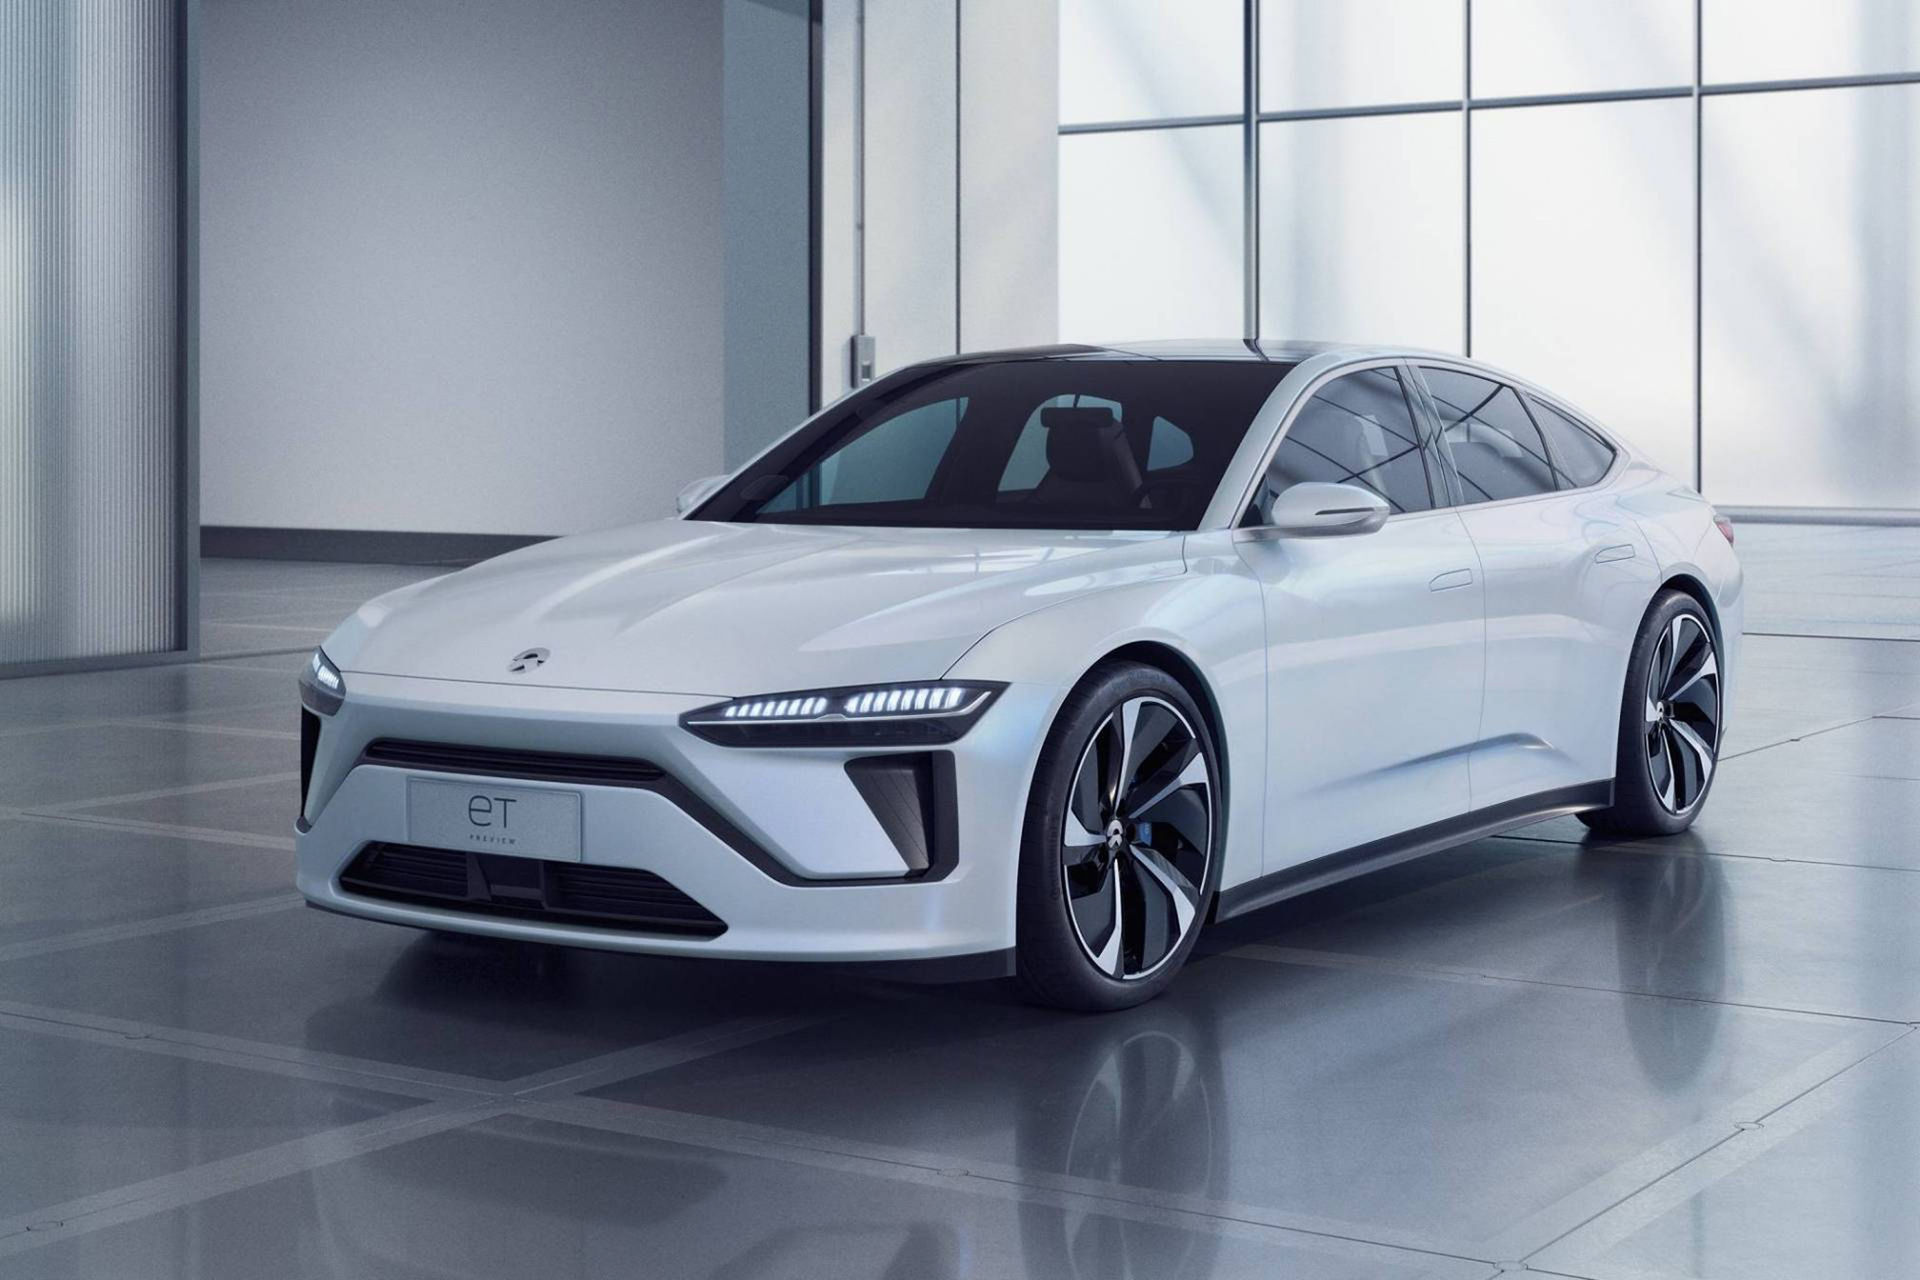 Nio visar nya eldrivna konceptbilen ET Preview